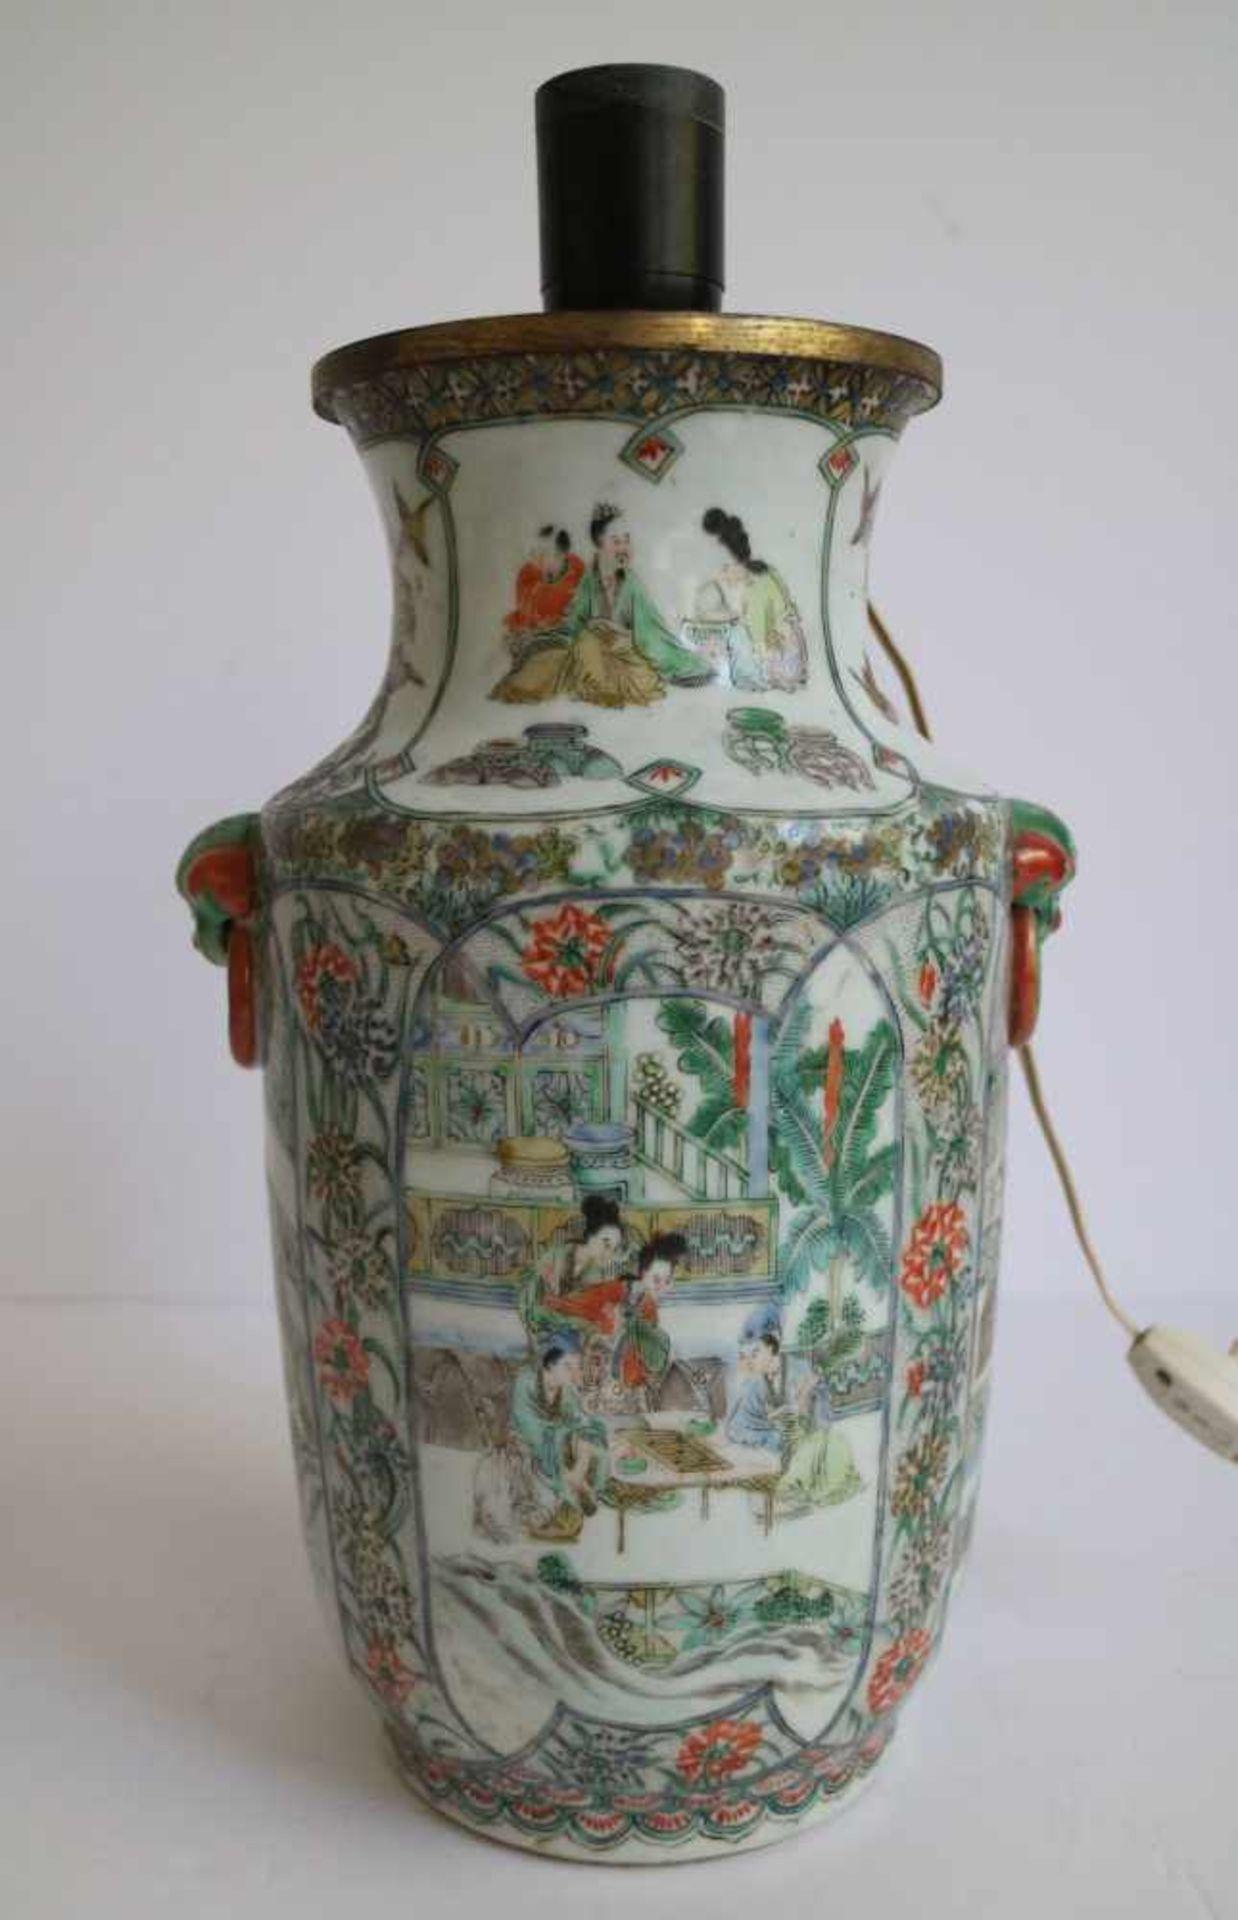 Los 278 - Chinese vases transformed into lampadaires H 22 en 30 cm (enkel vazen) restorations